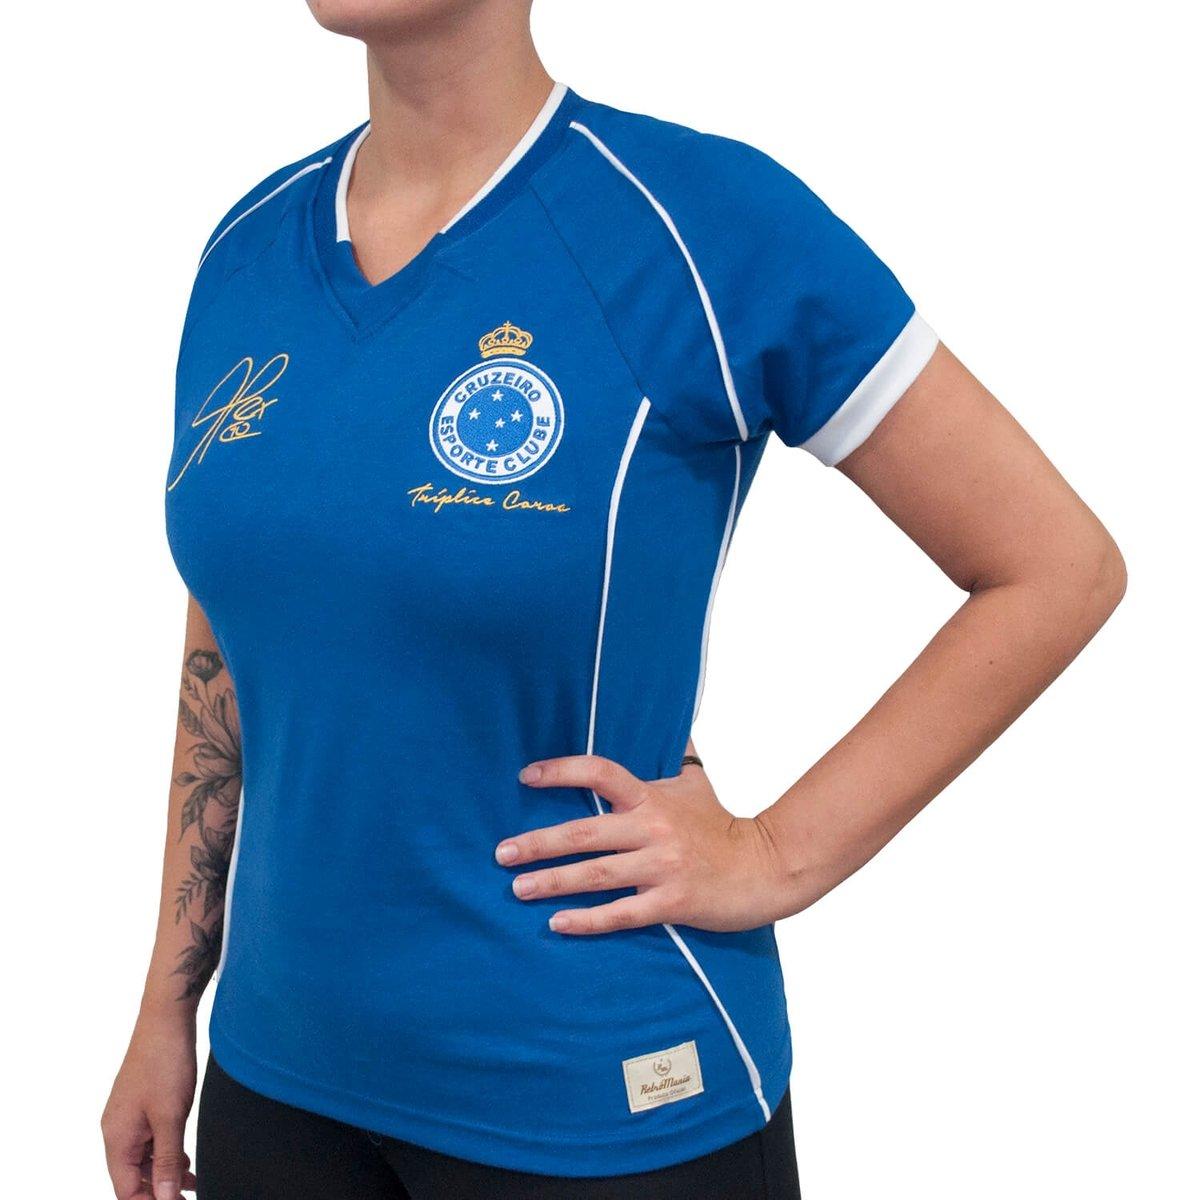 ... Camisa Retrô Mania Cruzeiro 2003 - Alex - Tríplice Coroa Feminina ... bd6adb9799fd5